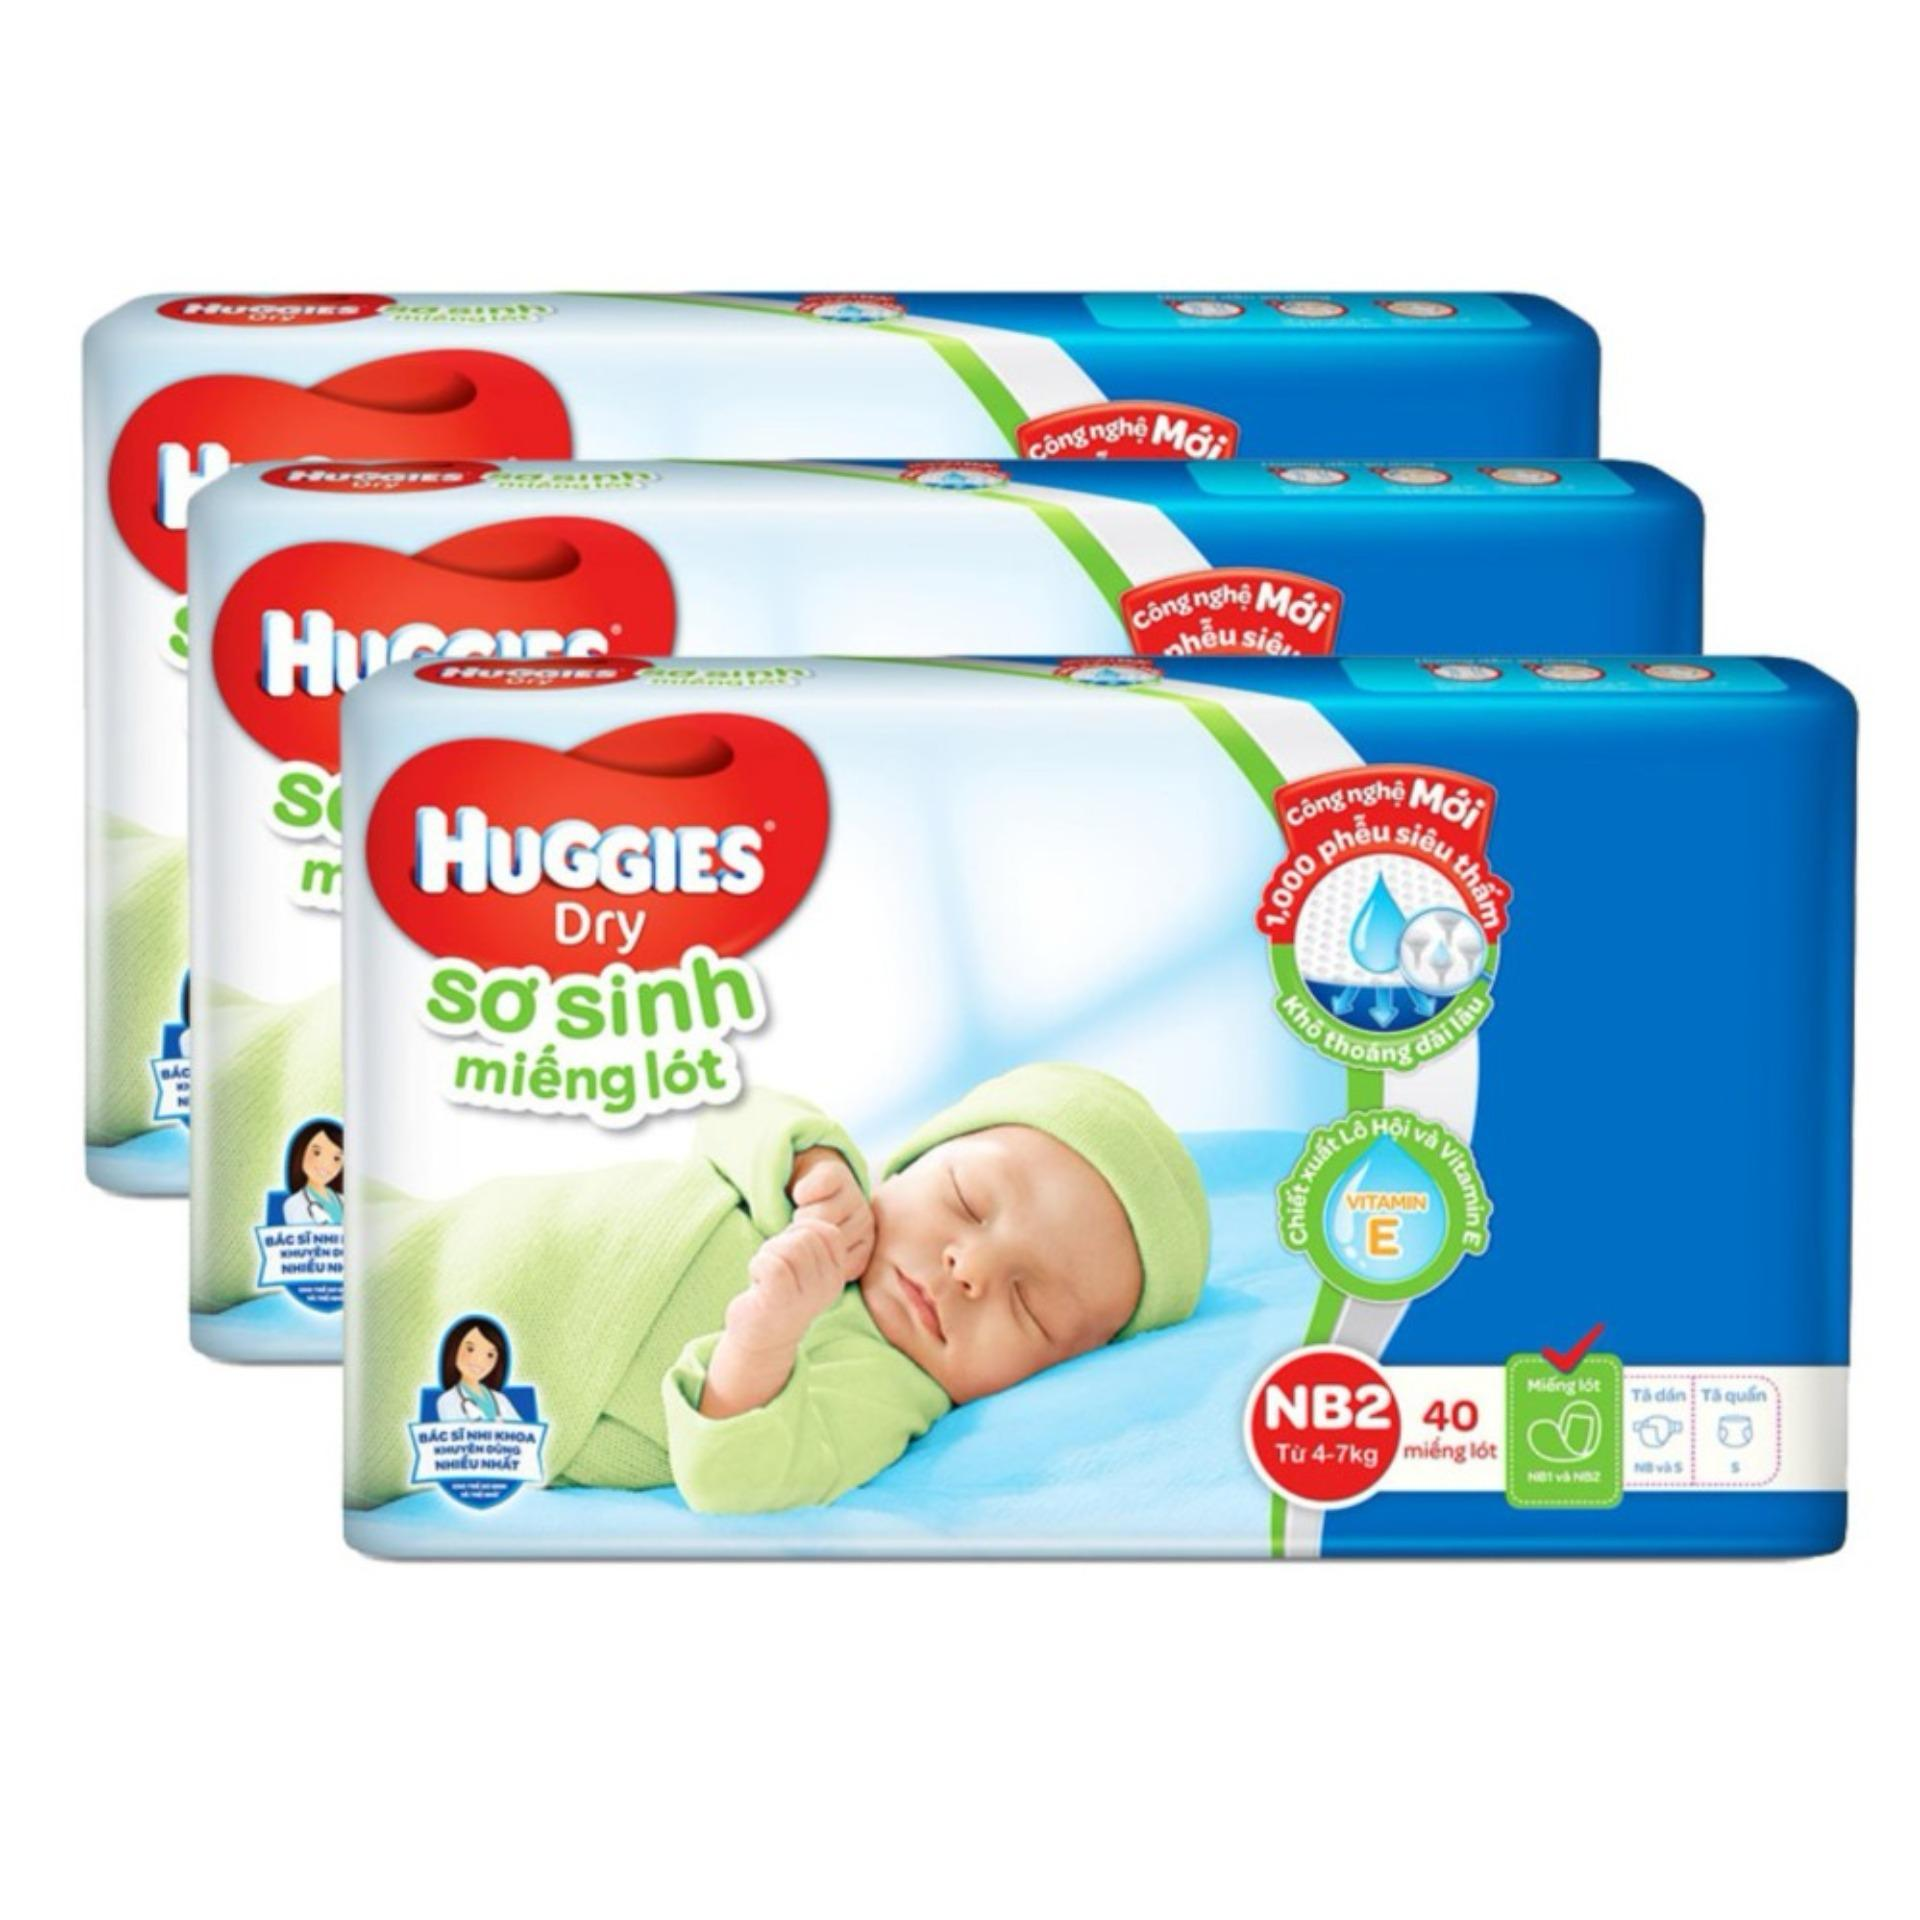 Mua Bộ 3 Miếng Lot Sơ Sinh Huggies Newborn 2 4 7Kg N40 Goi 40 Miếng